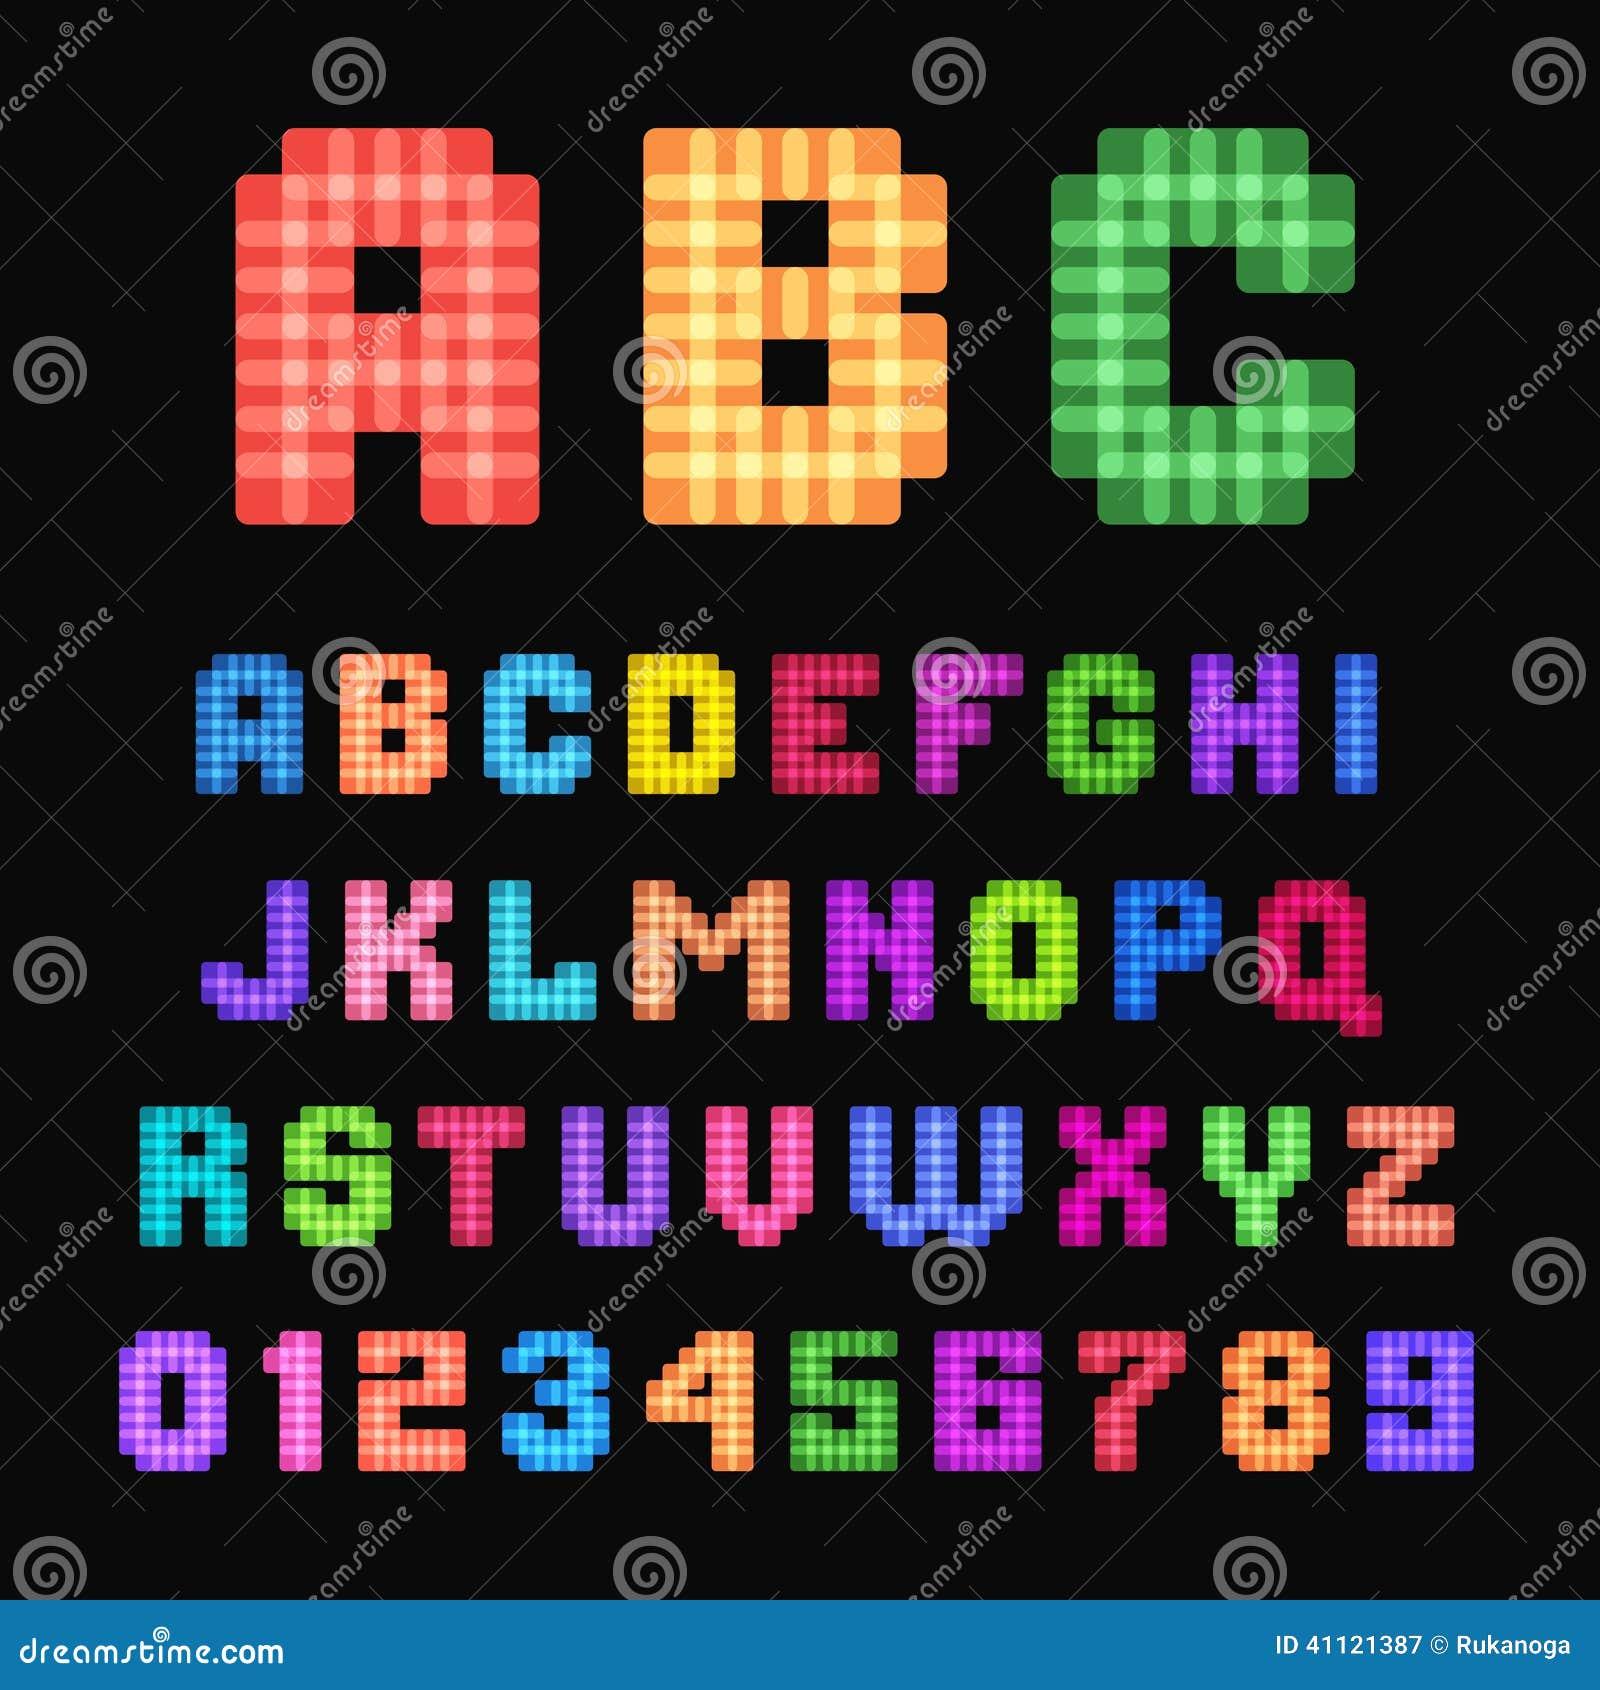 Pixel Font. Stock Vector. Illustration Of Multicolor